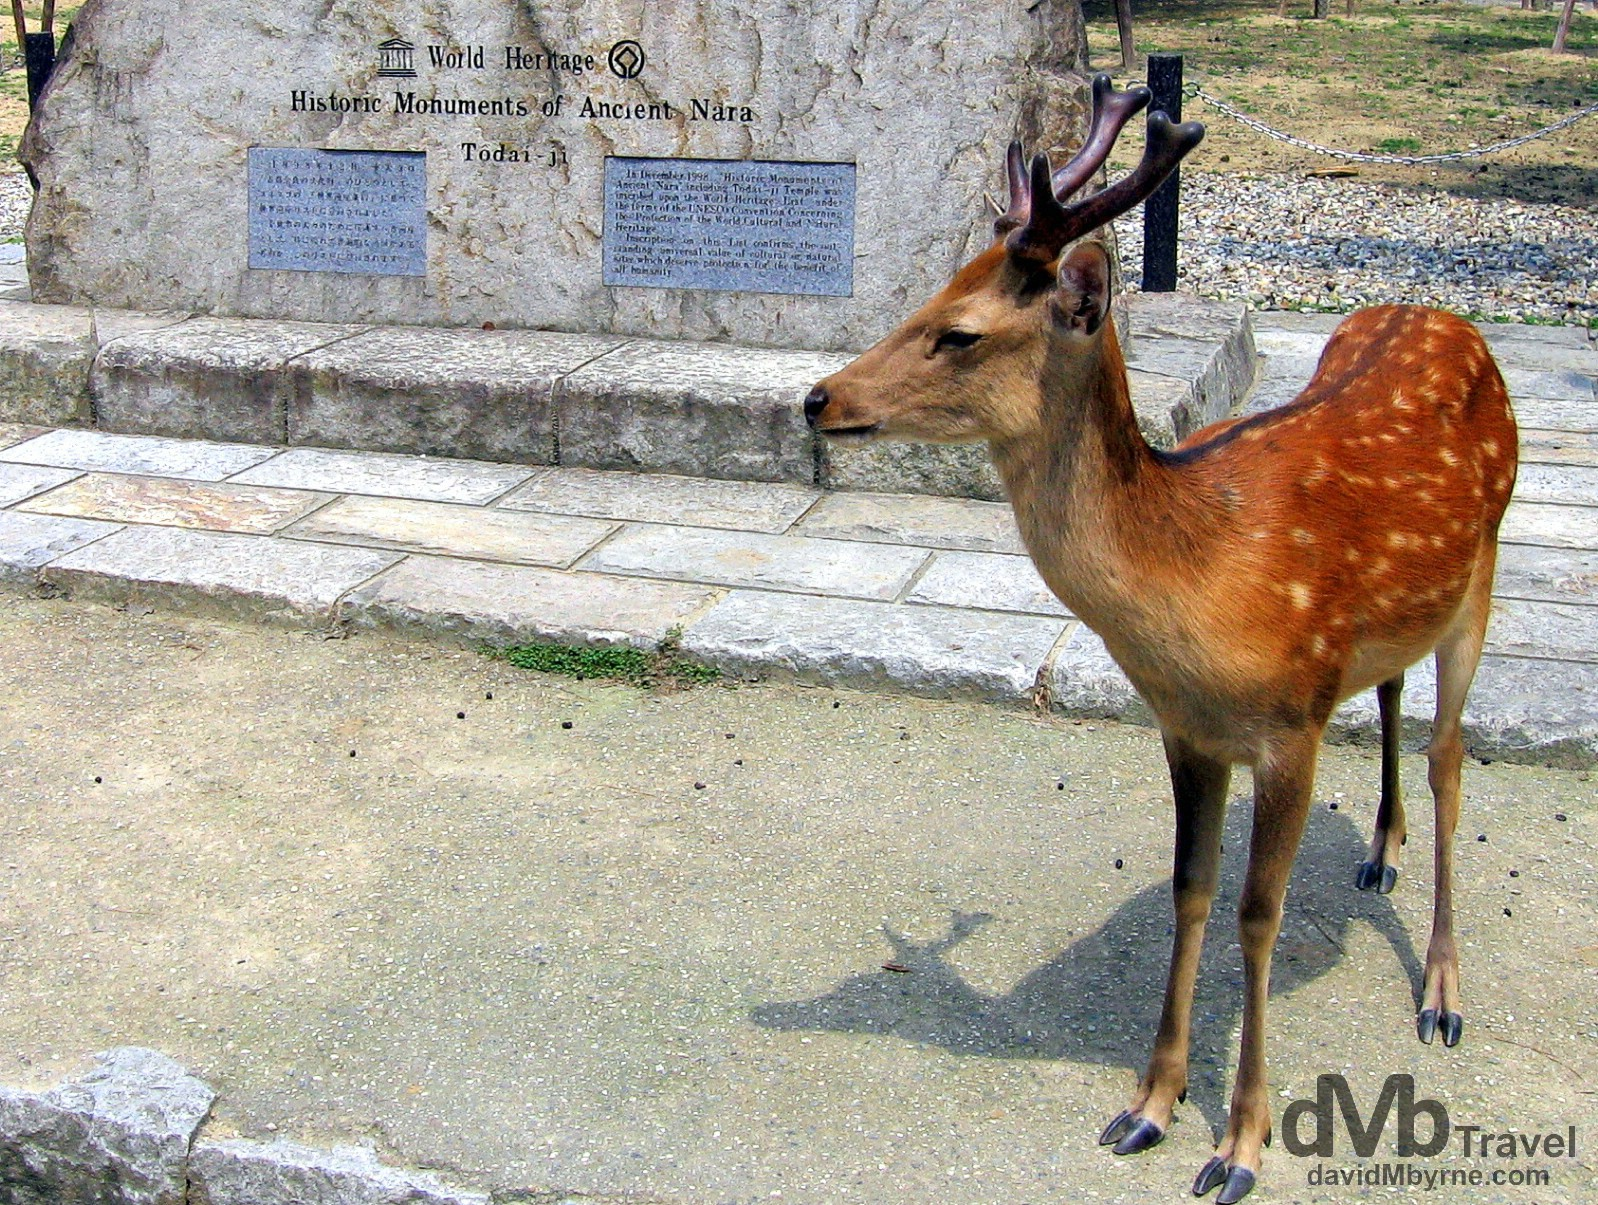 A deer fronting the UNESCO plinth in Nara Koen (Park), Nara, Honshu, Japan. July 19th, 2005.